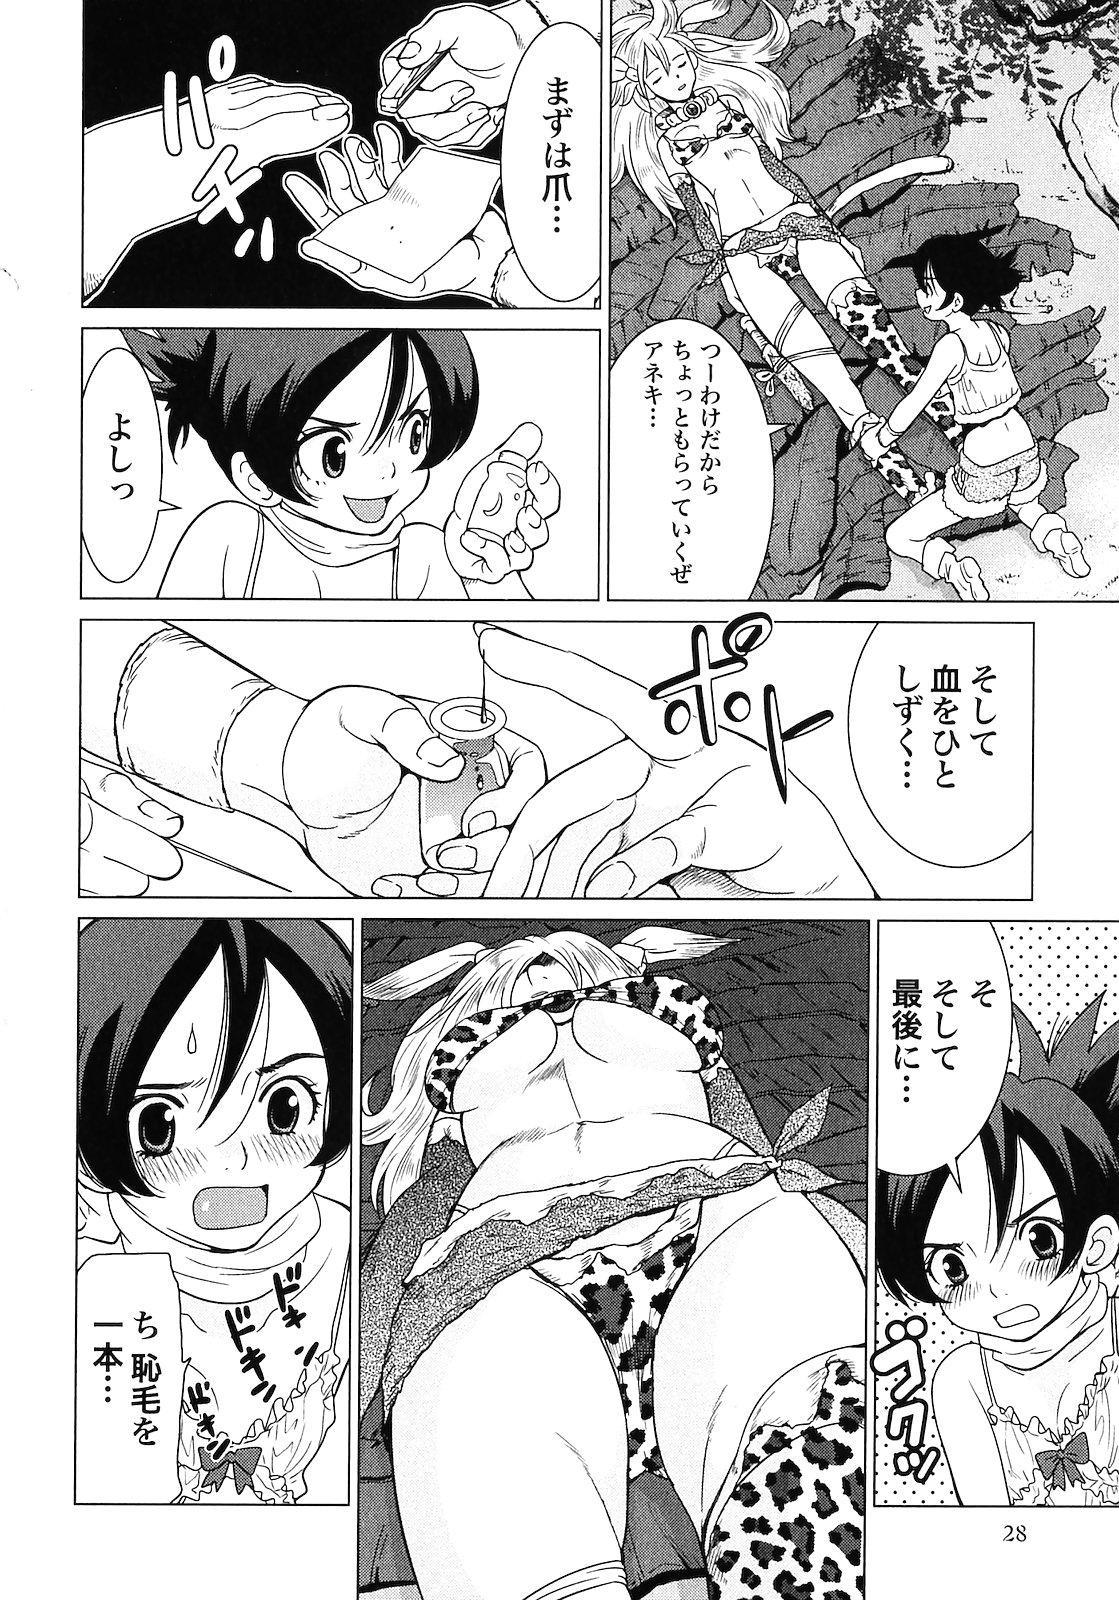 Makyo no Shanana Vol.02 29